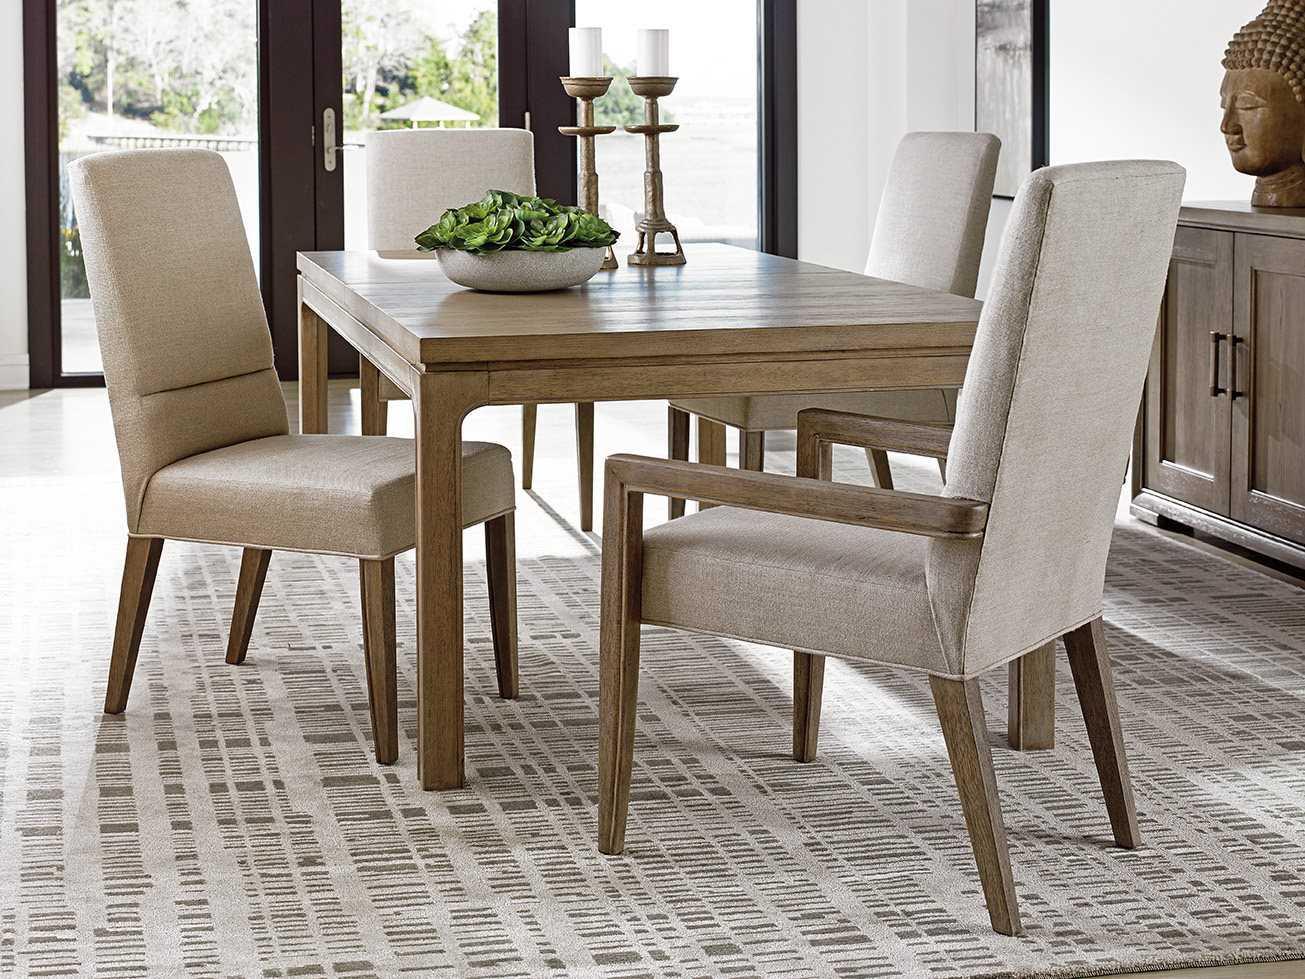 lexington dining room | Lexington Shadow Play Dining Room Set | LXSHADODINSET4